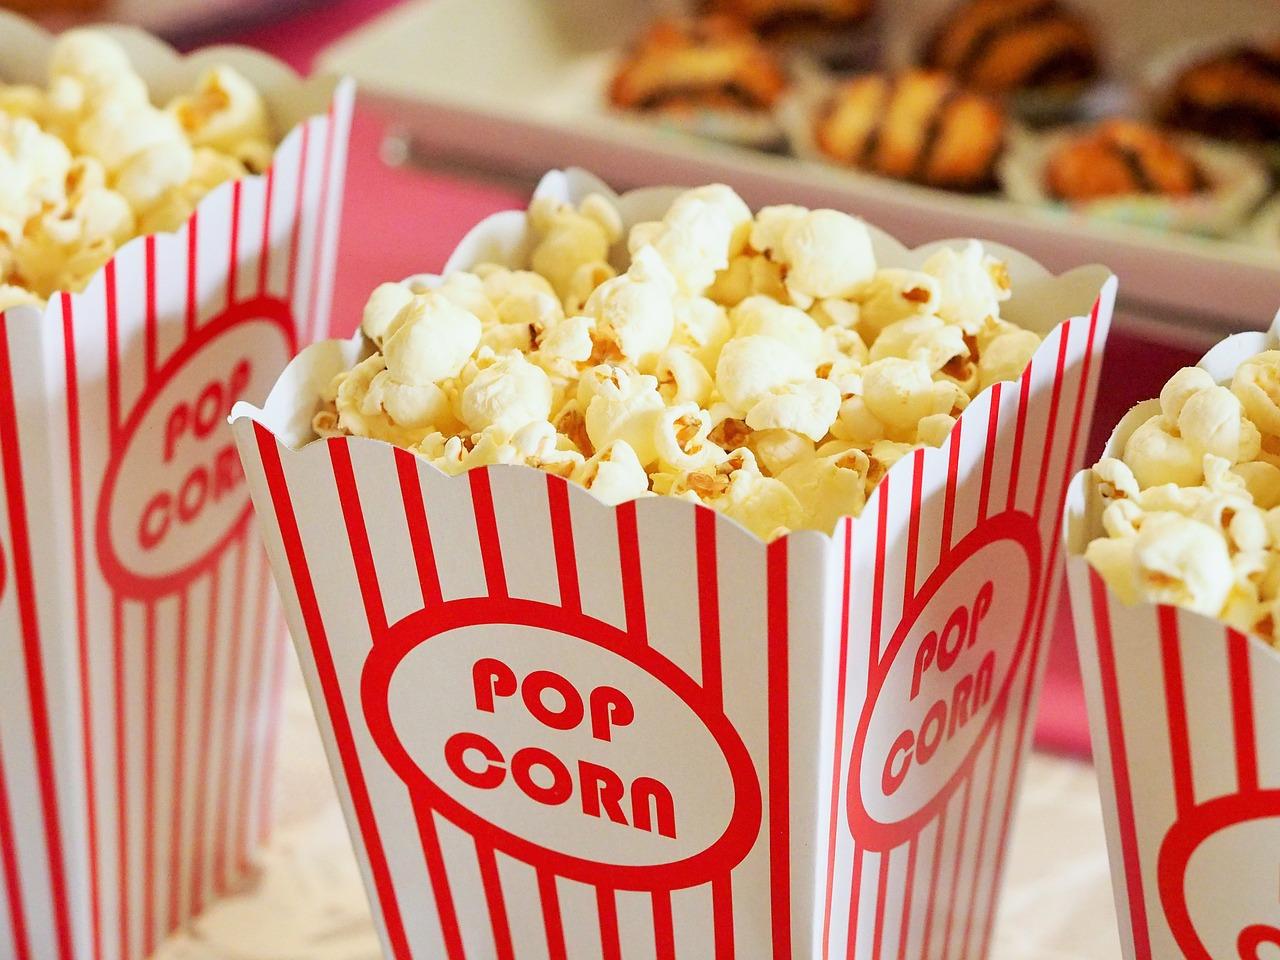 Popcorn 1085072 1280